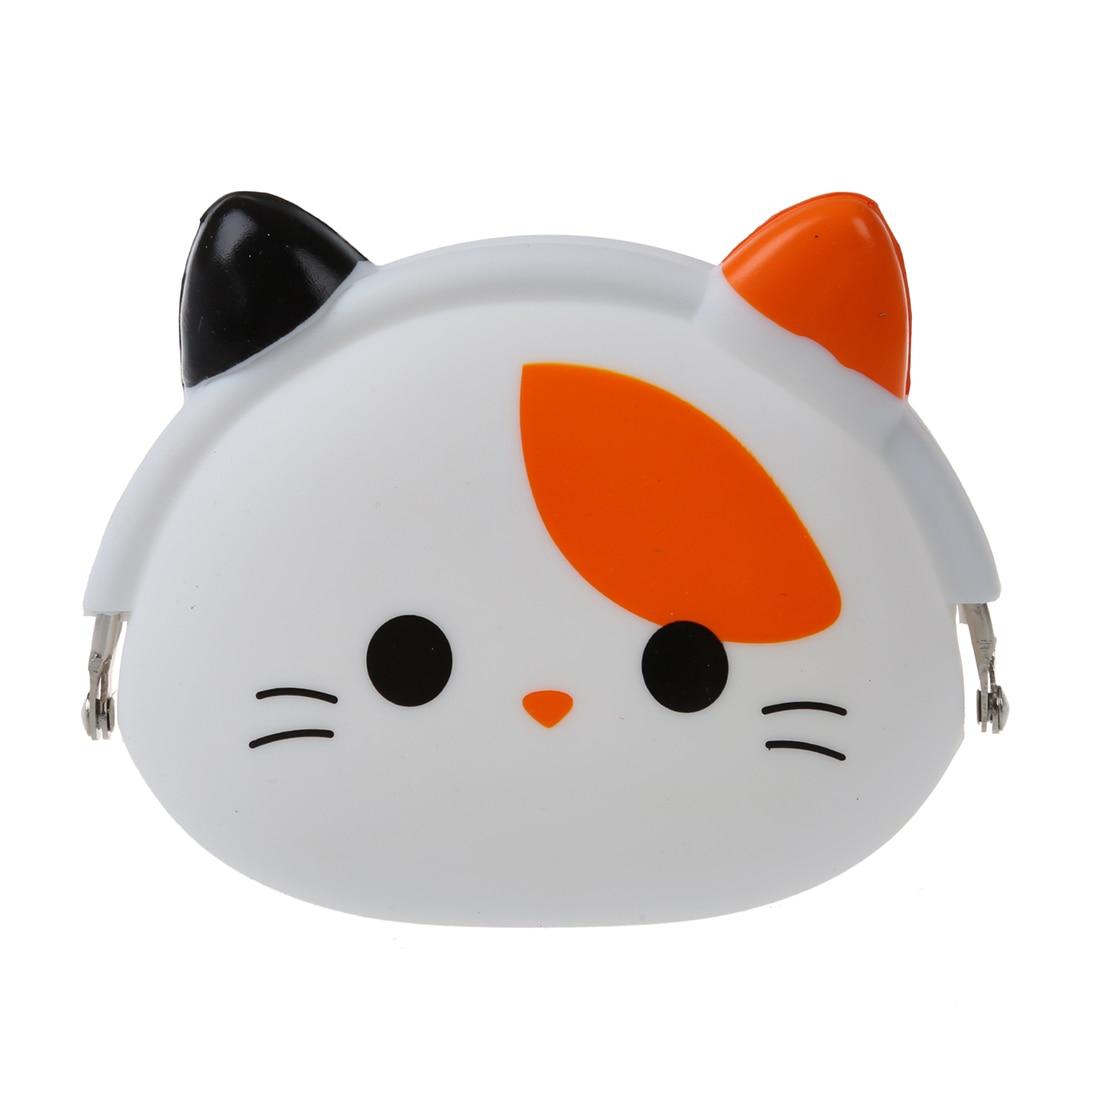 5pcs( ABDB-Women Girls Wallet Kawaii Cute Cartoon Animal Silicone Jelly Coin Bag Purse Kids Gift Small Cat